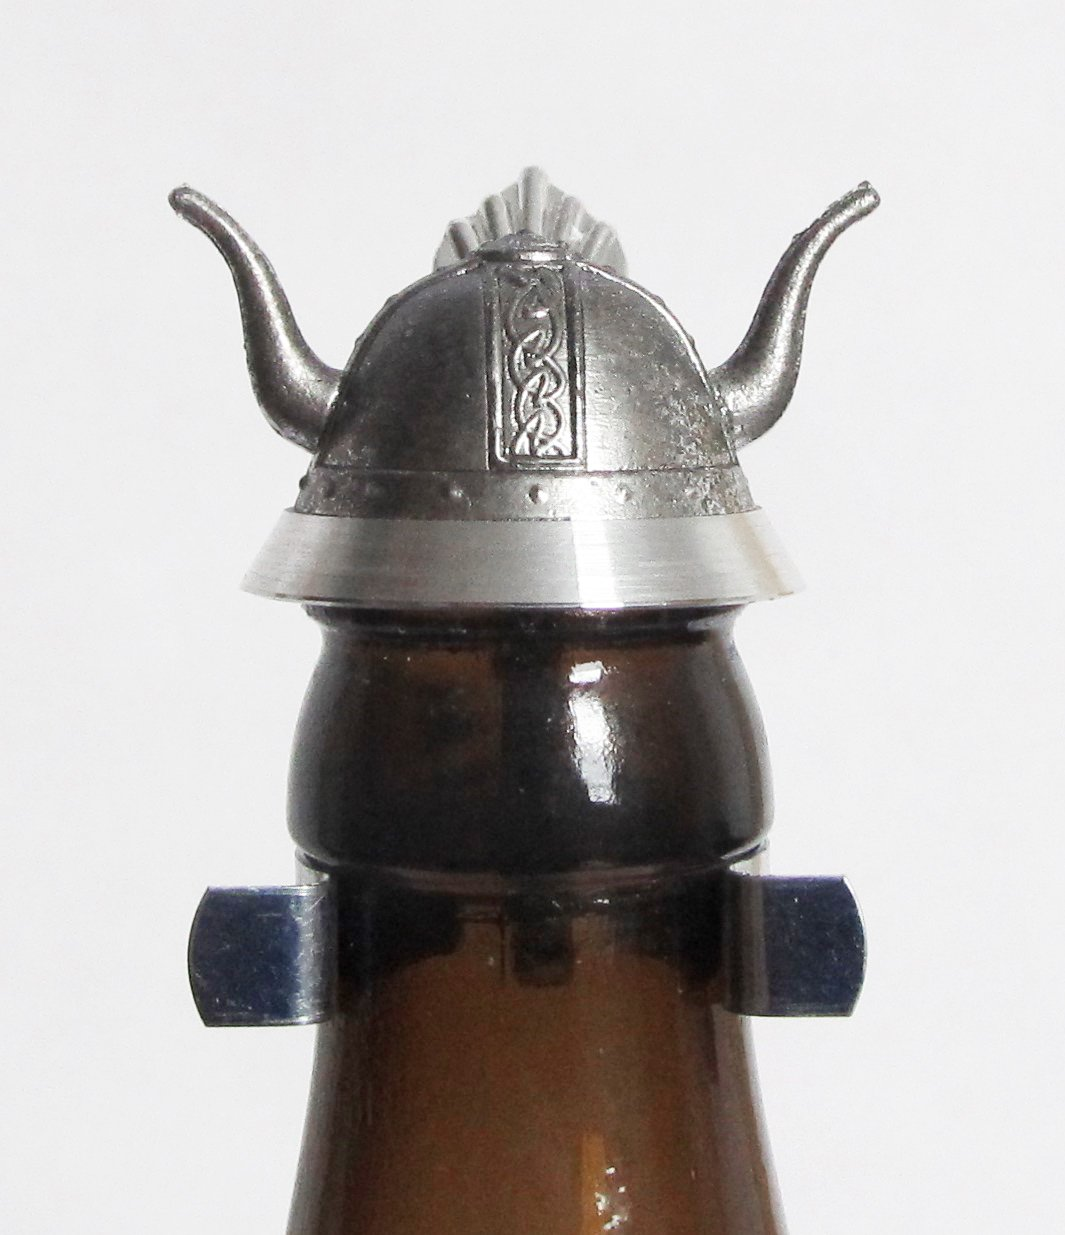 Viking Helmet Oktoberfest Party Favor Beer Bottle Stein Lid | Pewter Viking Horn Helmet Beer Stein Lid for Bottles | Made in Germany